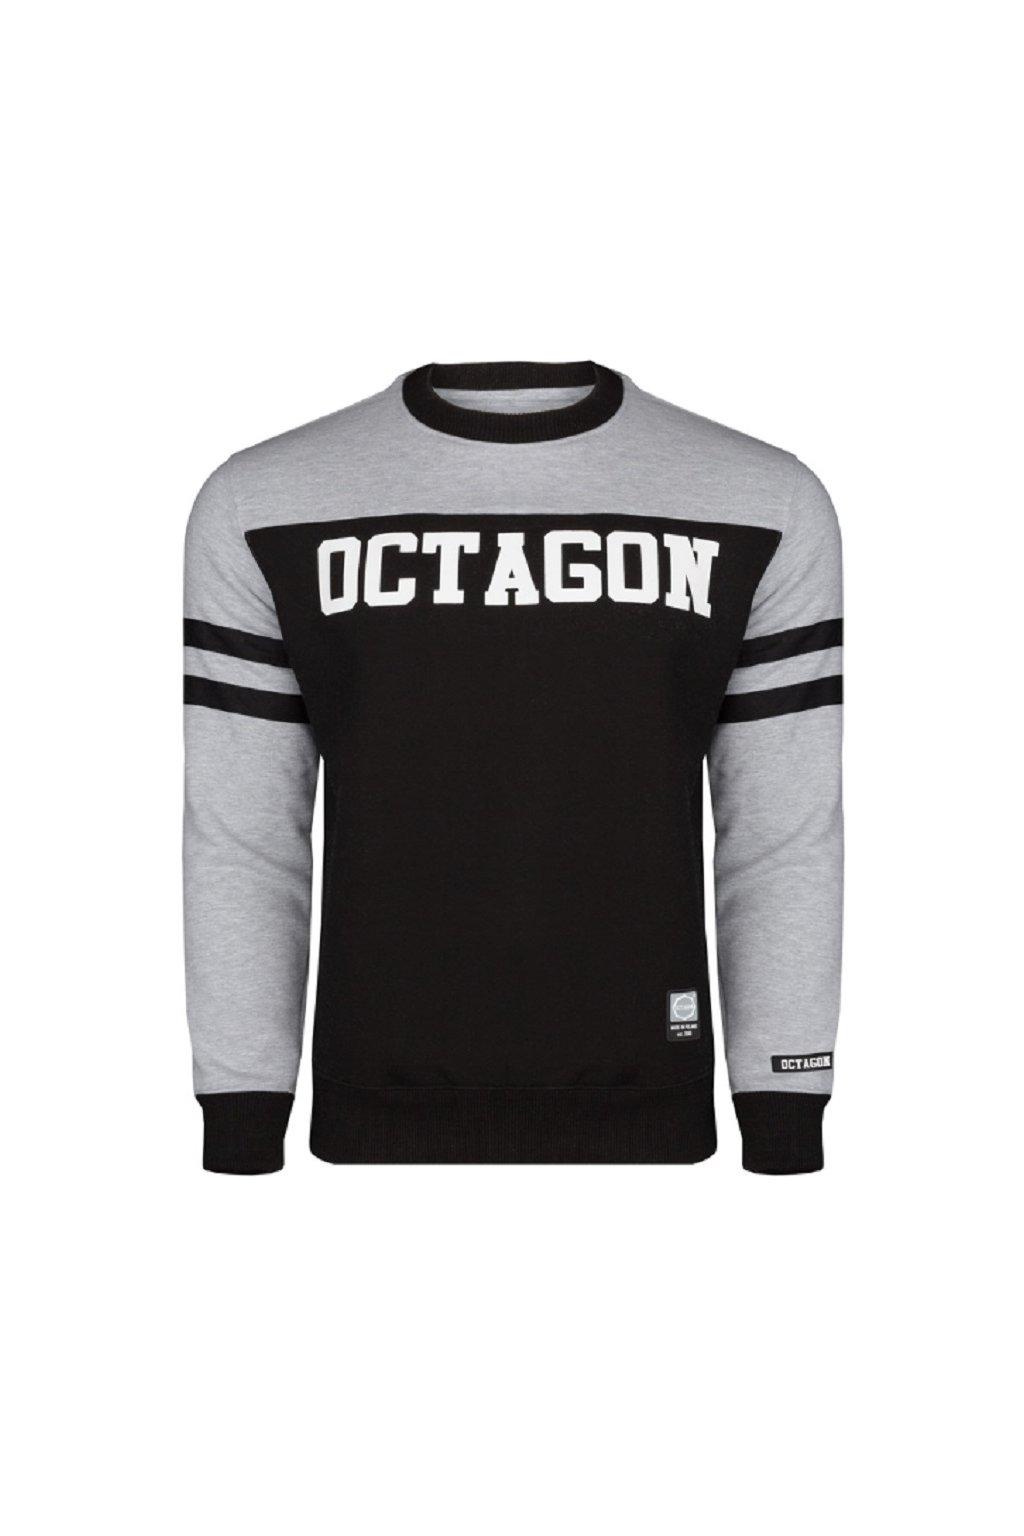 Pánská mikina OCTAGON LINE černo šedá obr1